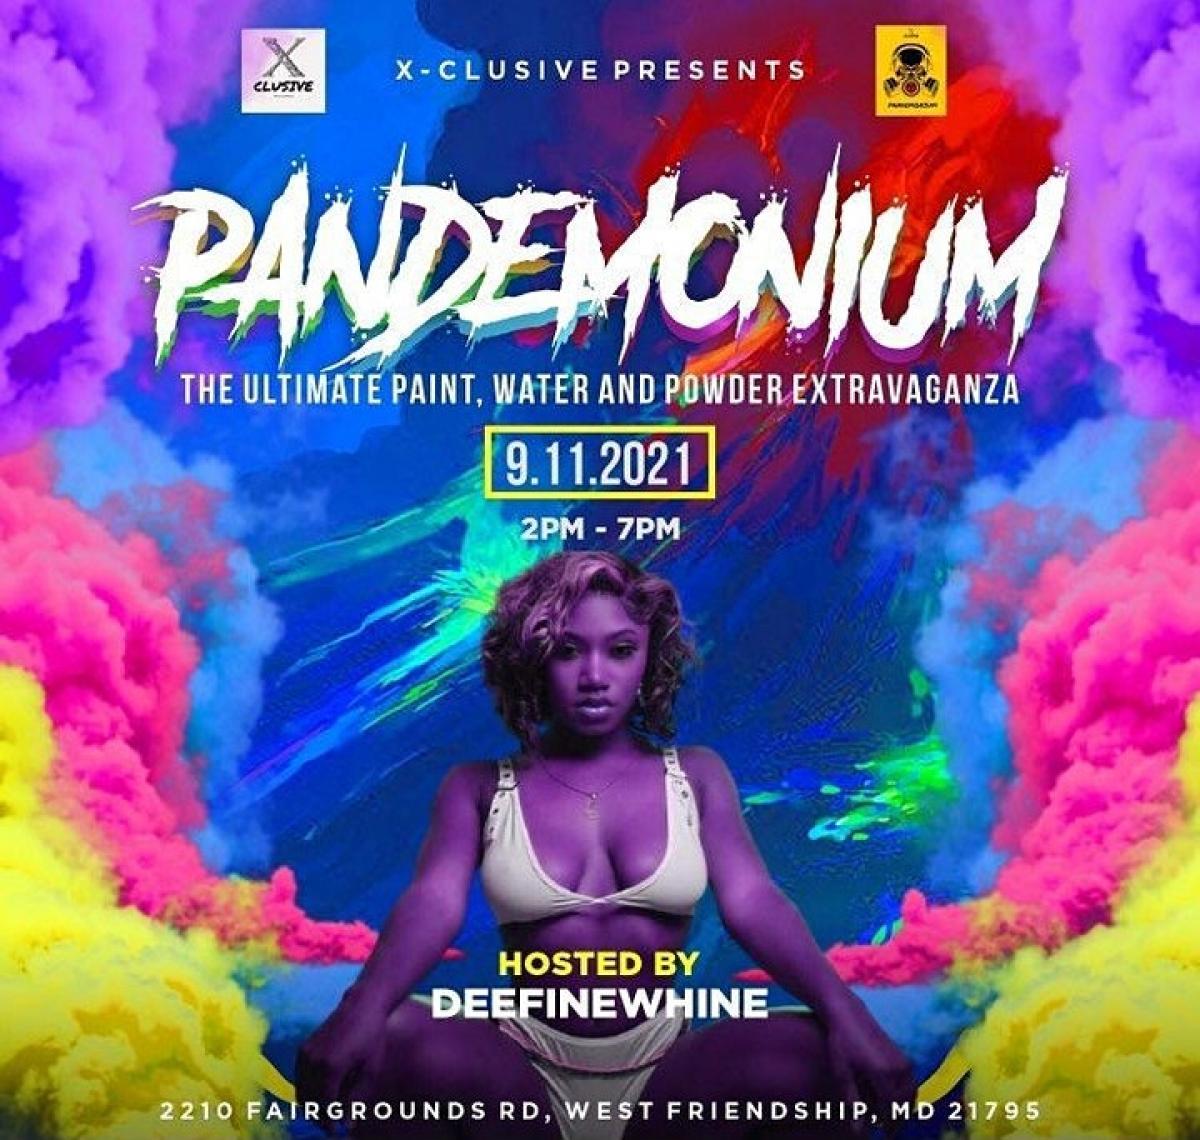 Pandemonium flyer or graphic.